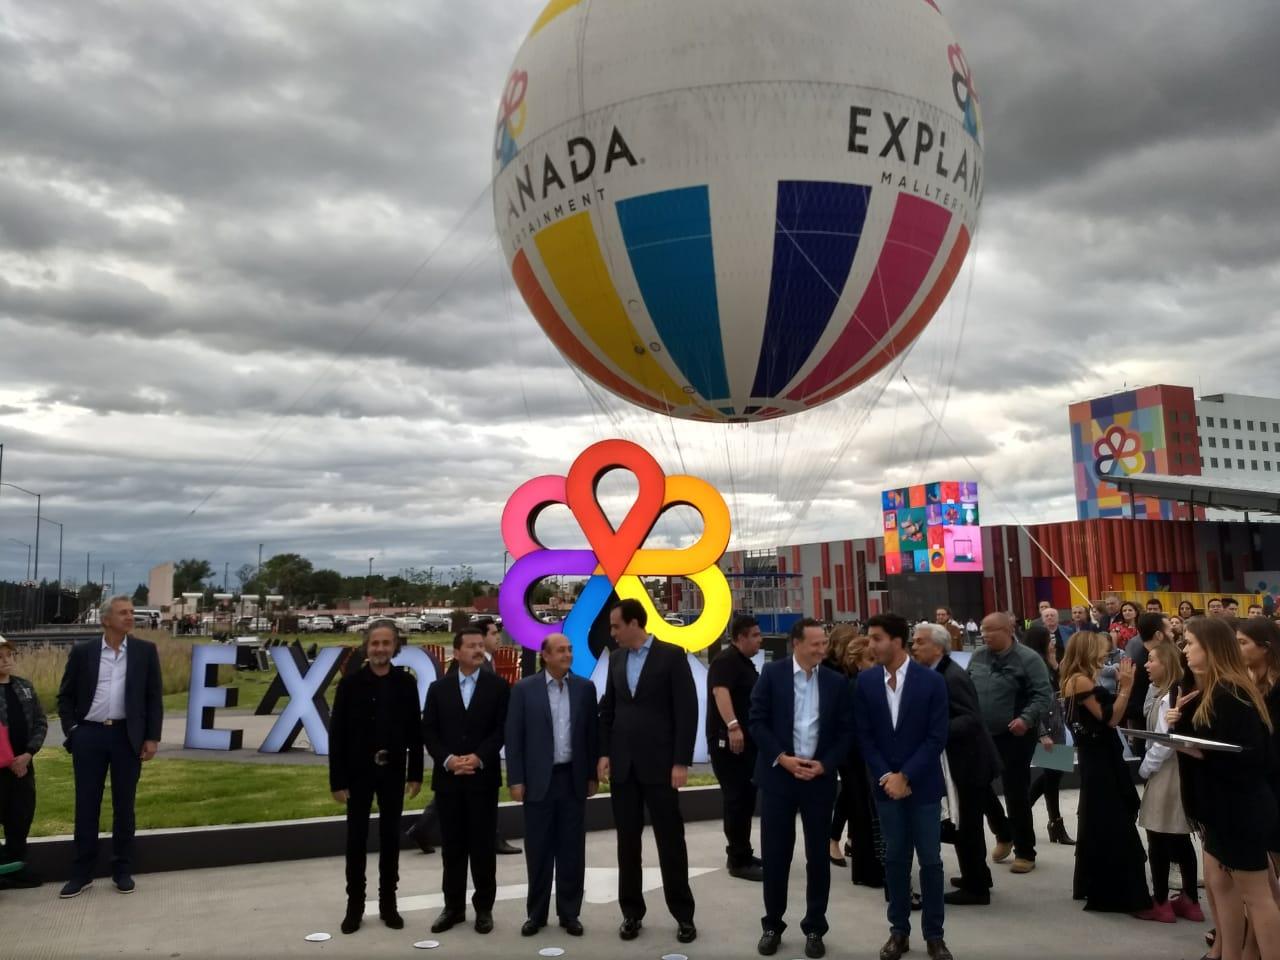 Gicsa inaugura el mallterteinment Explanada Puebla